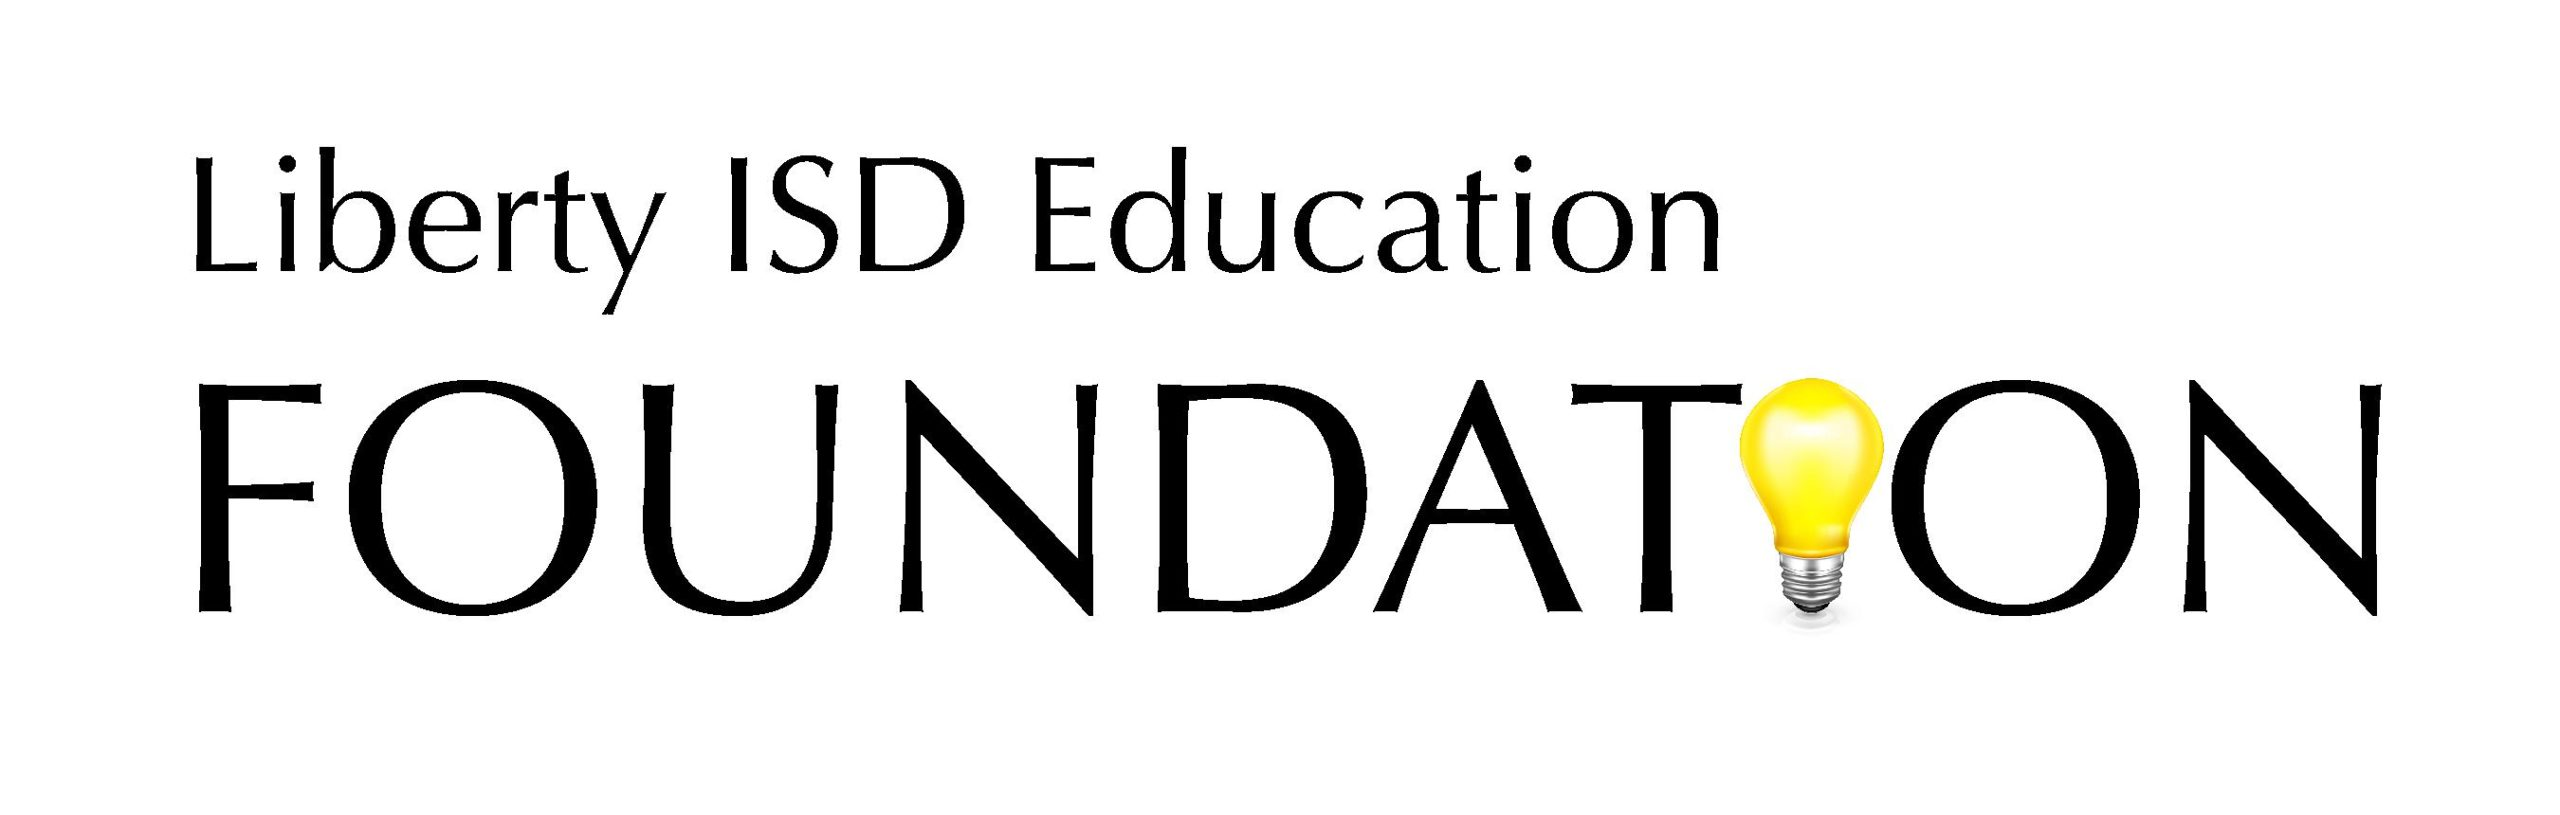 Liberty Education Foundation